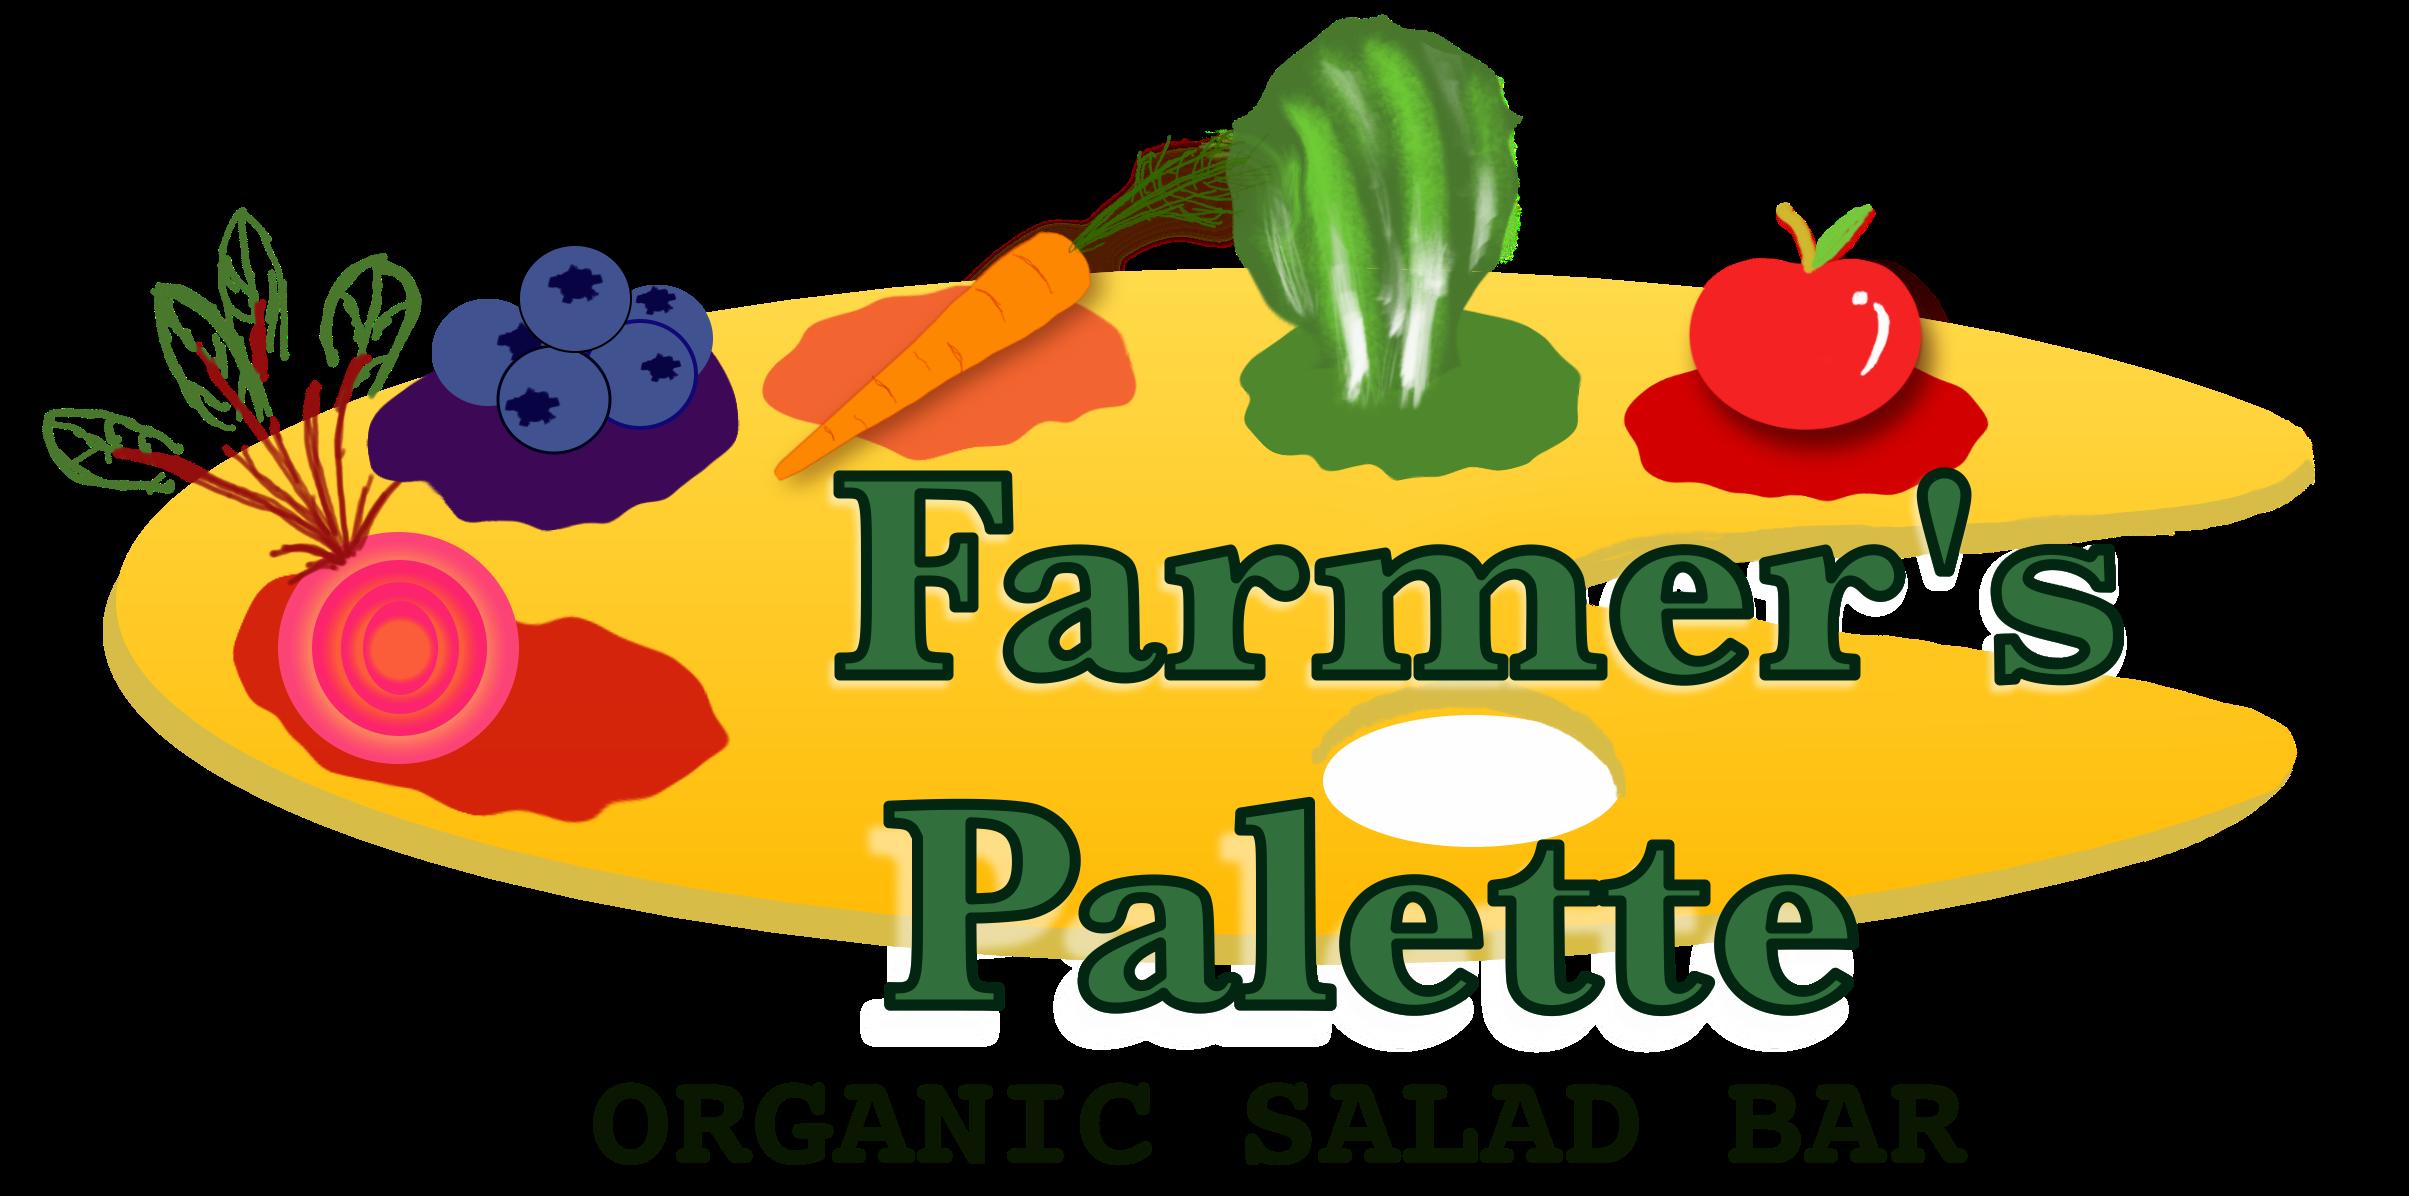 Farming clipart local food. Farmers palette